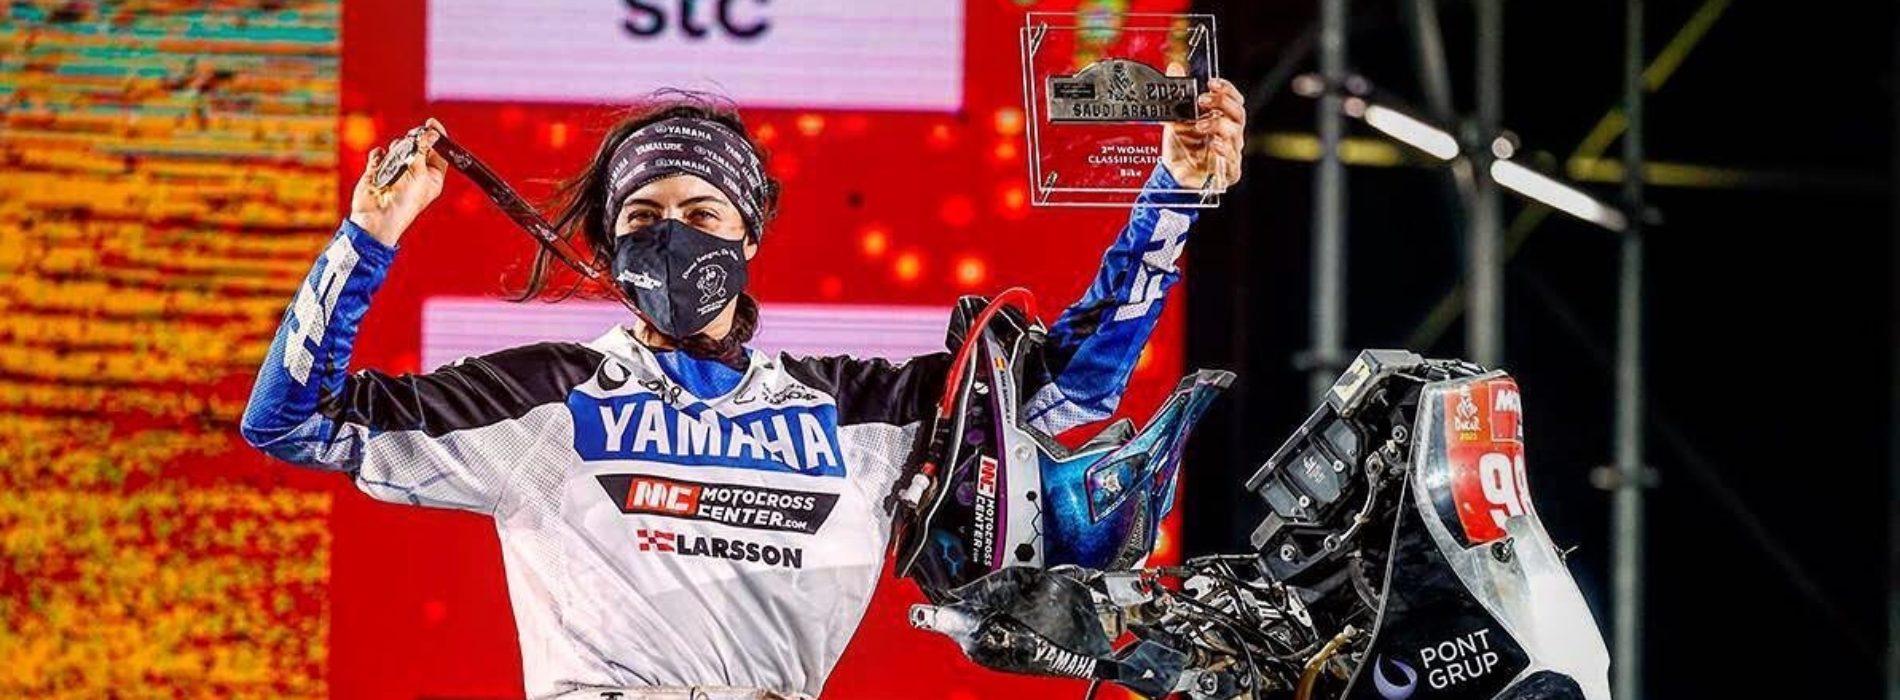 Amazing victories for Women racing and finishing Dakar Rally 2021!